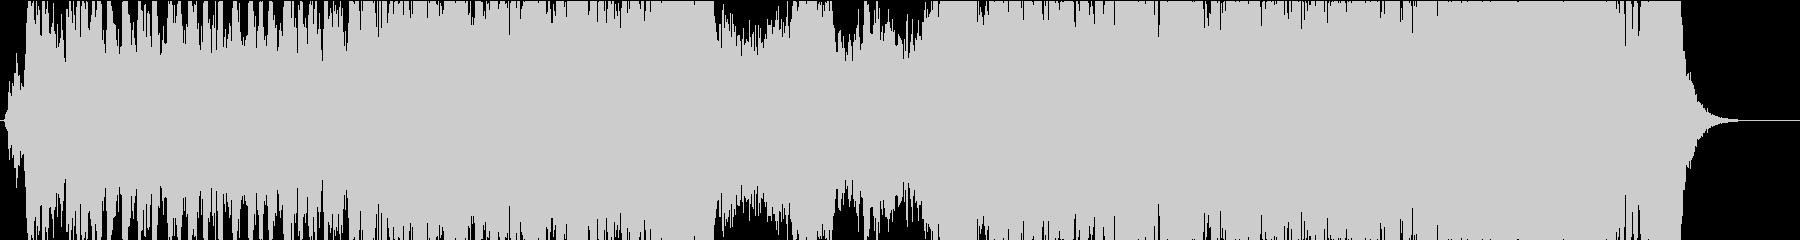 PV等に使えそうな激しめのオーケストラ曲の未再生の波形